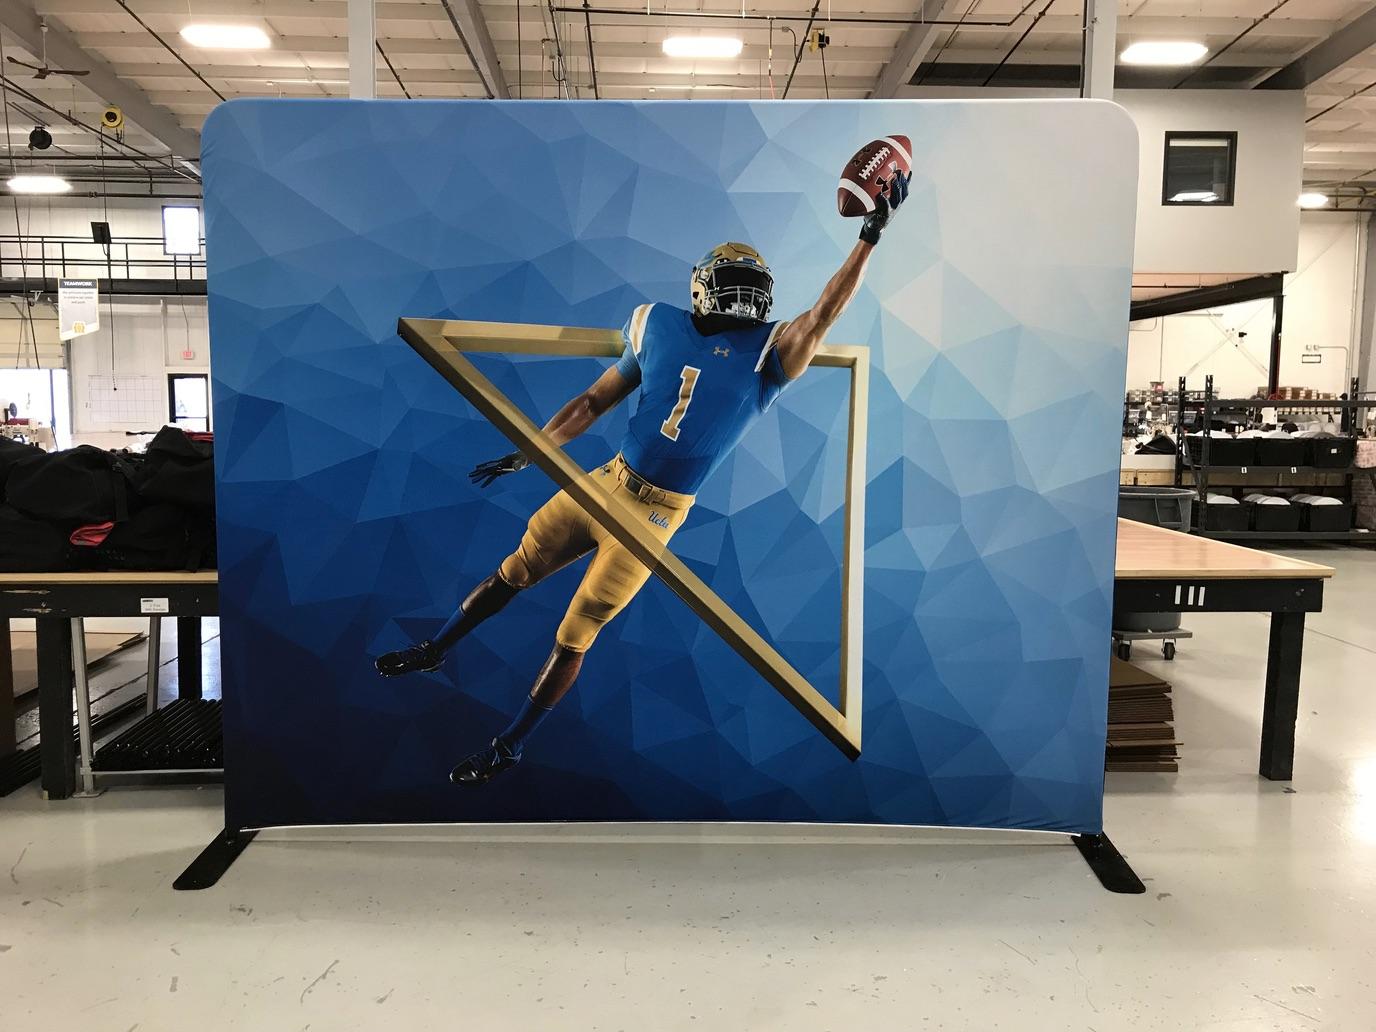 UCLA football media backdrop